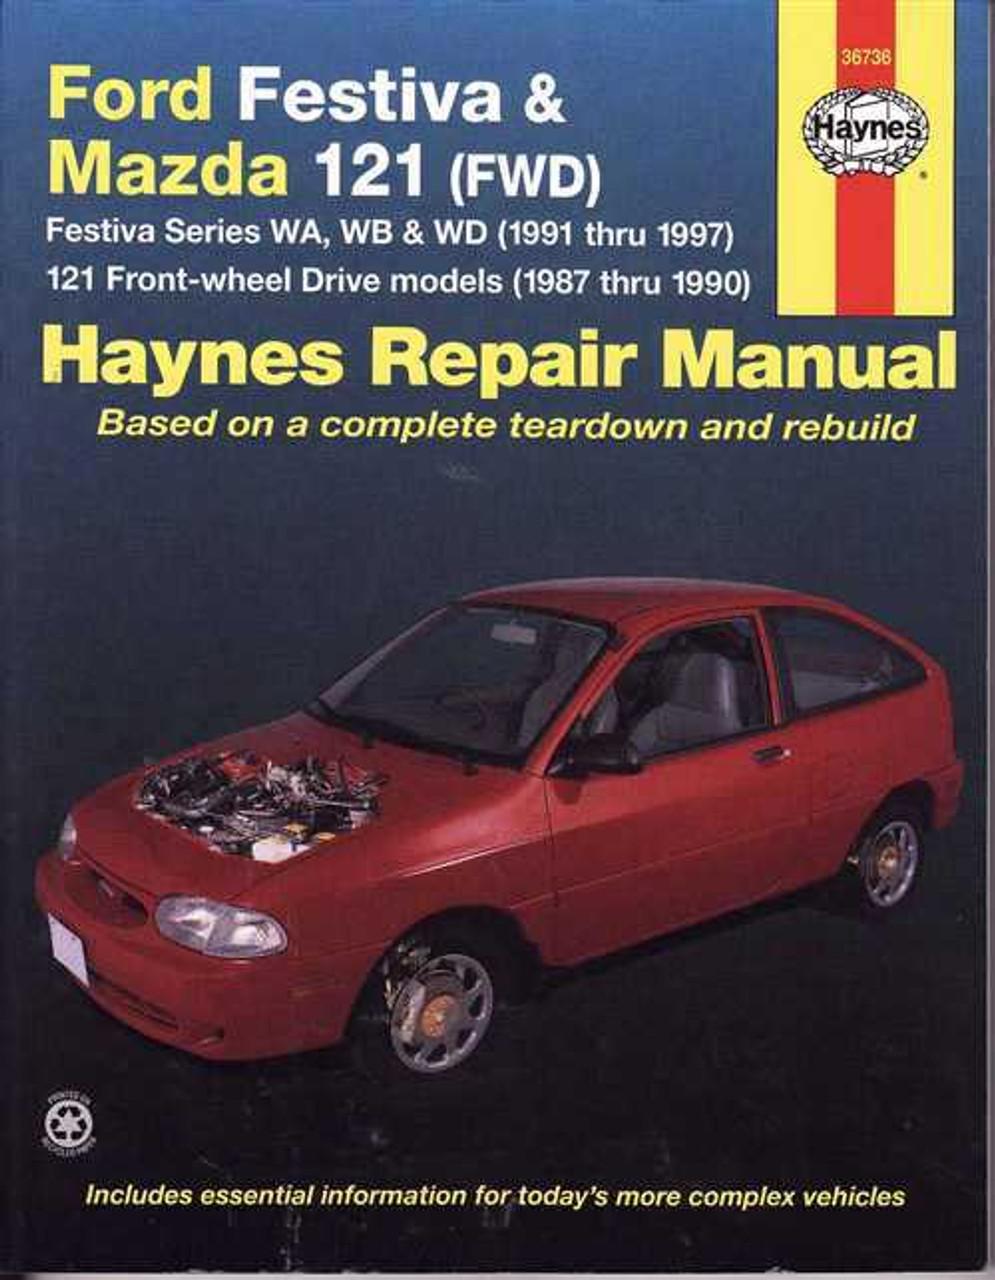 ford festiva wa wb wd amp mazda 121 1987 1997 workshop manual rh automotobookshop com au 2002 Ford Festiva 1999 Ford Festiva